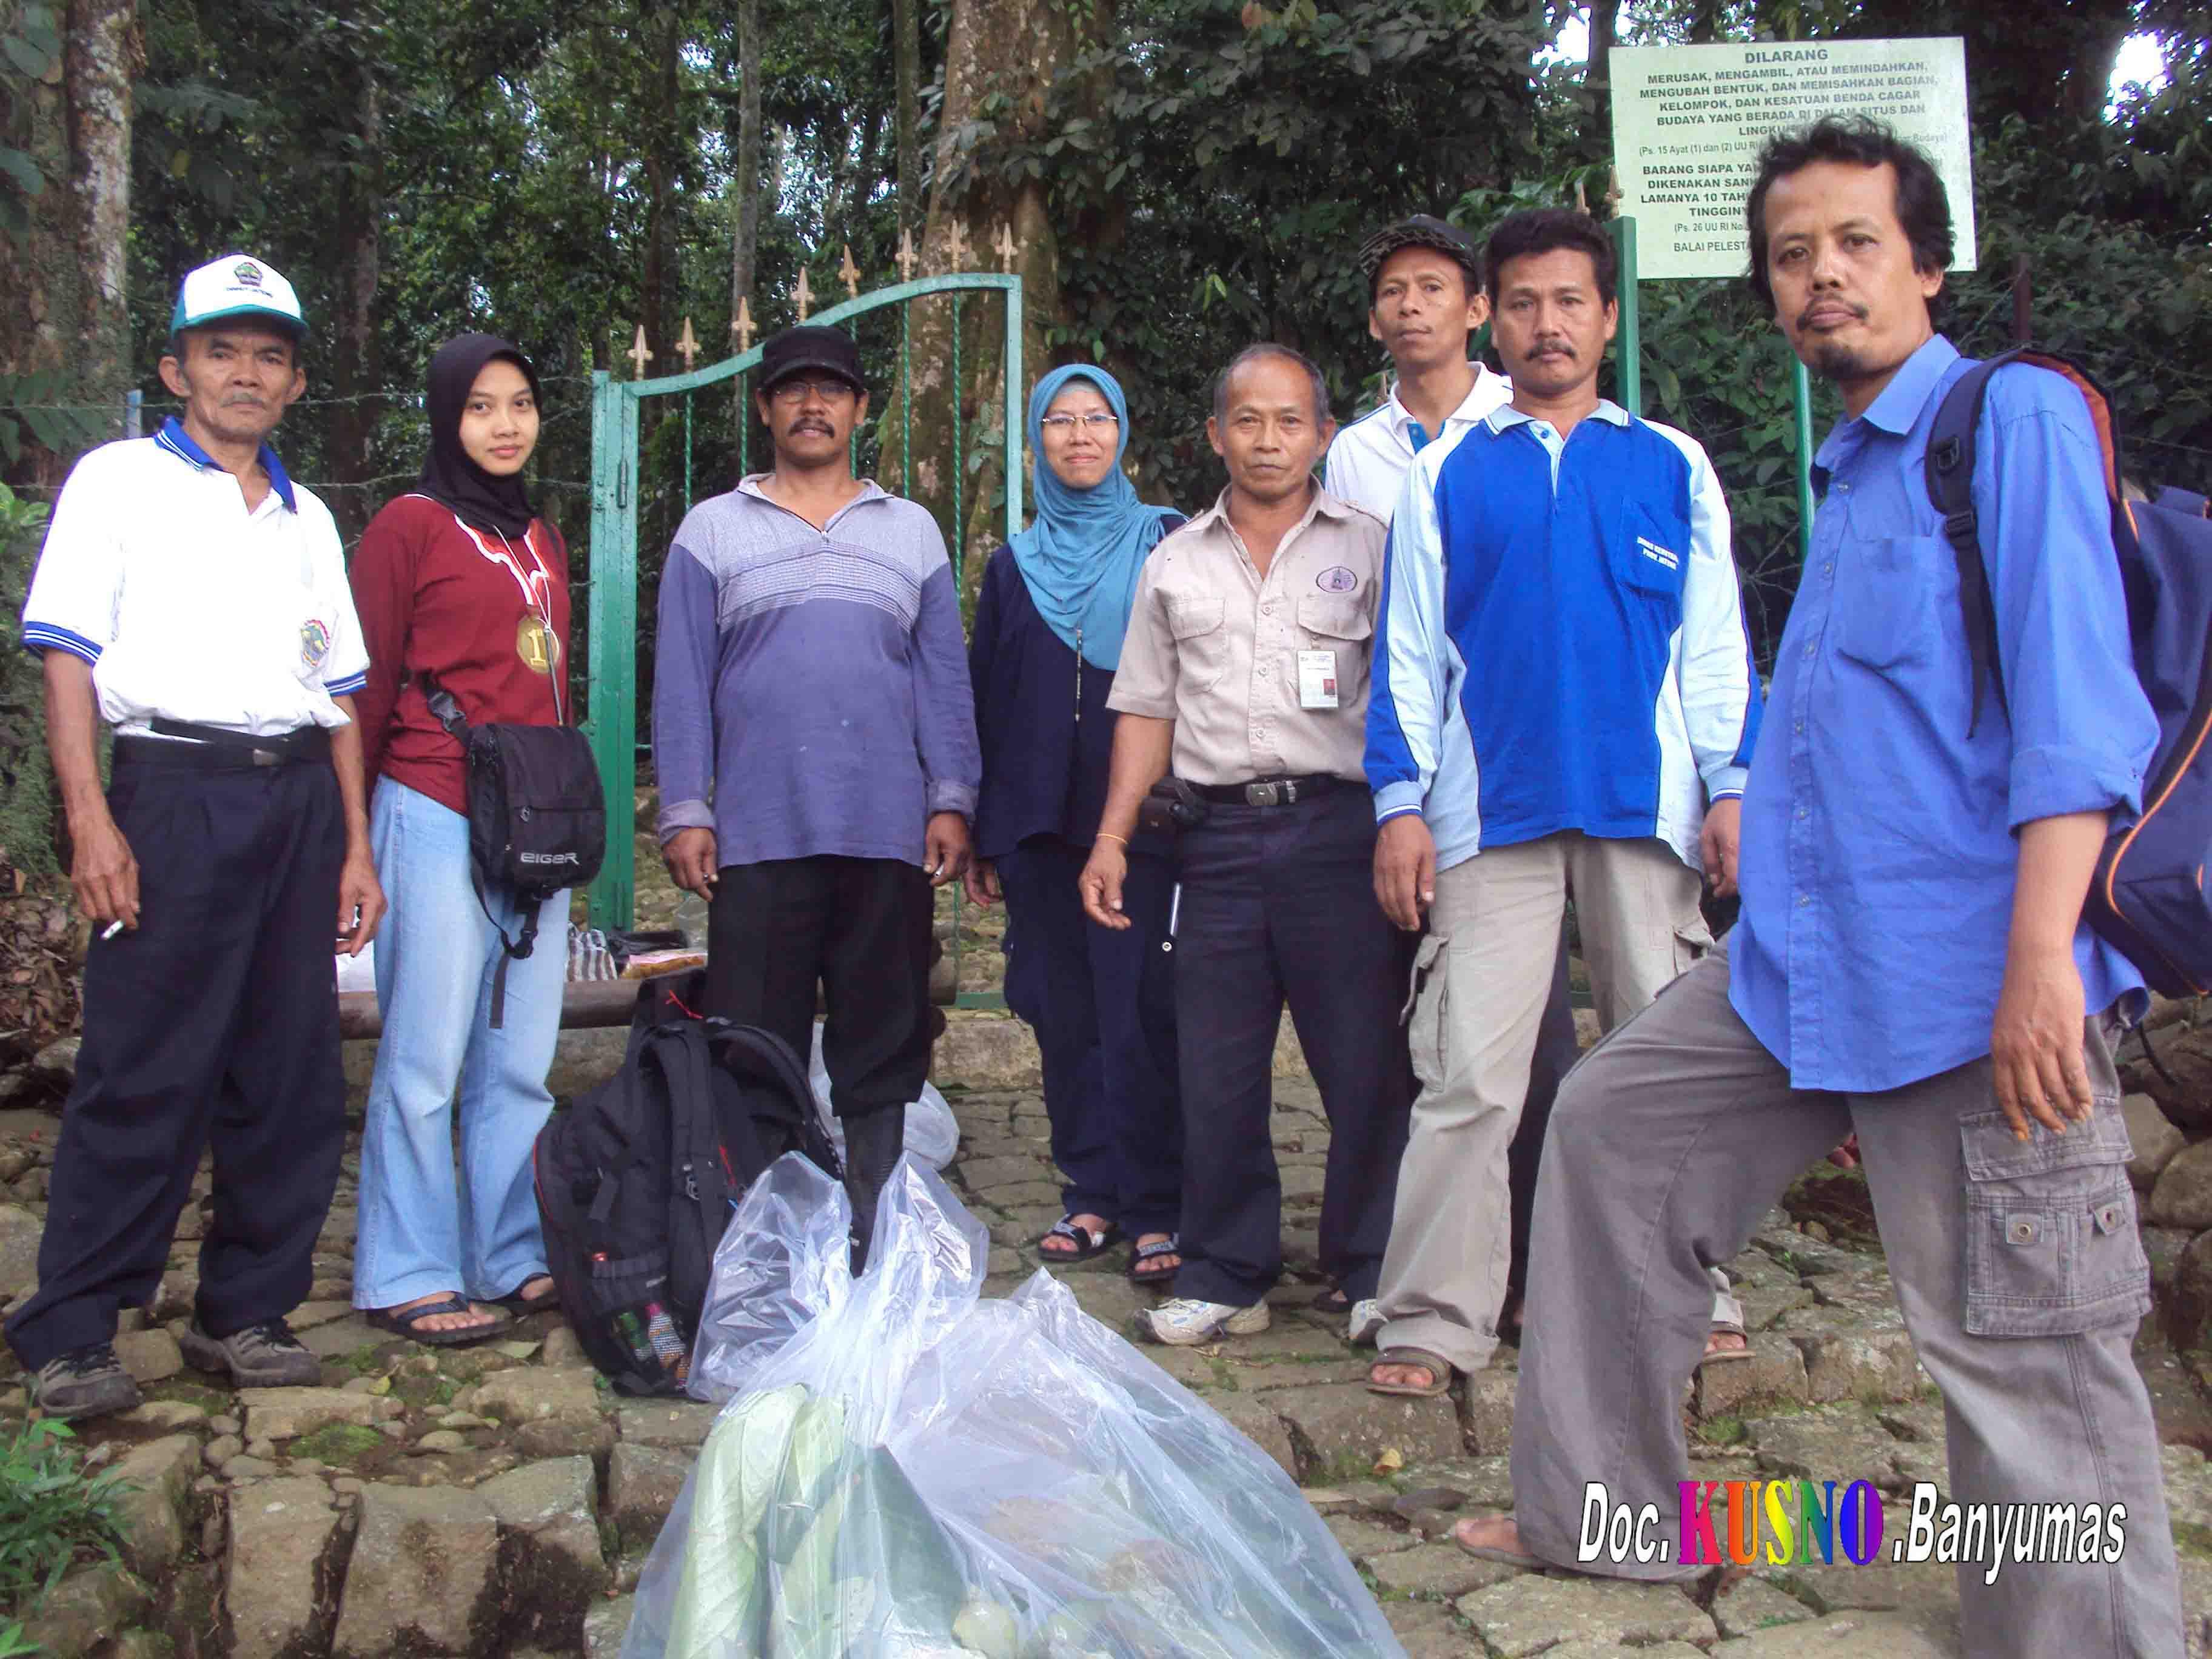 Bersama Lipi Kbn Raya Bogor Maskusno Wisata Batur Agung Kab